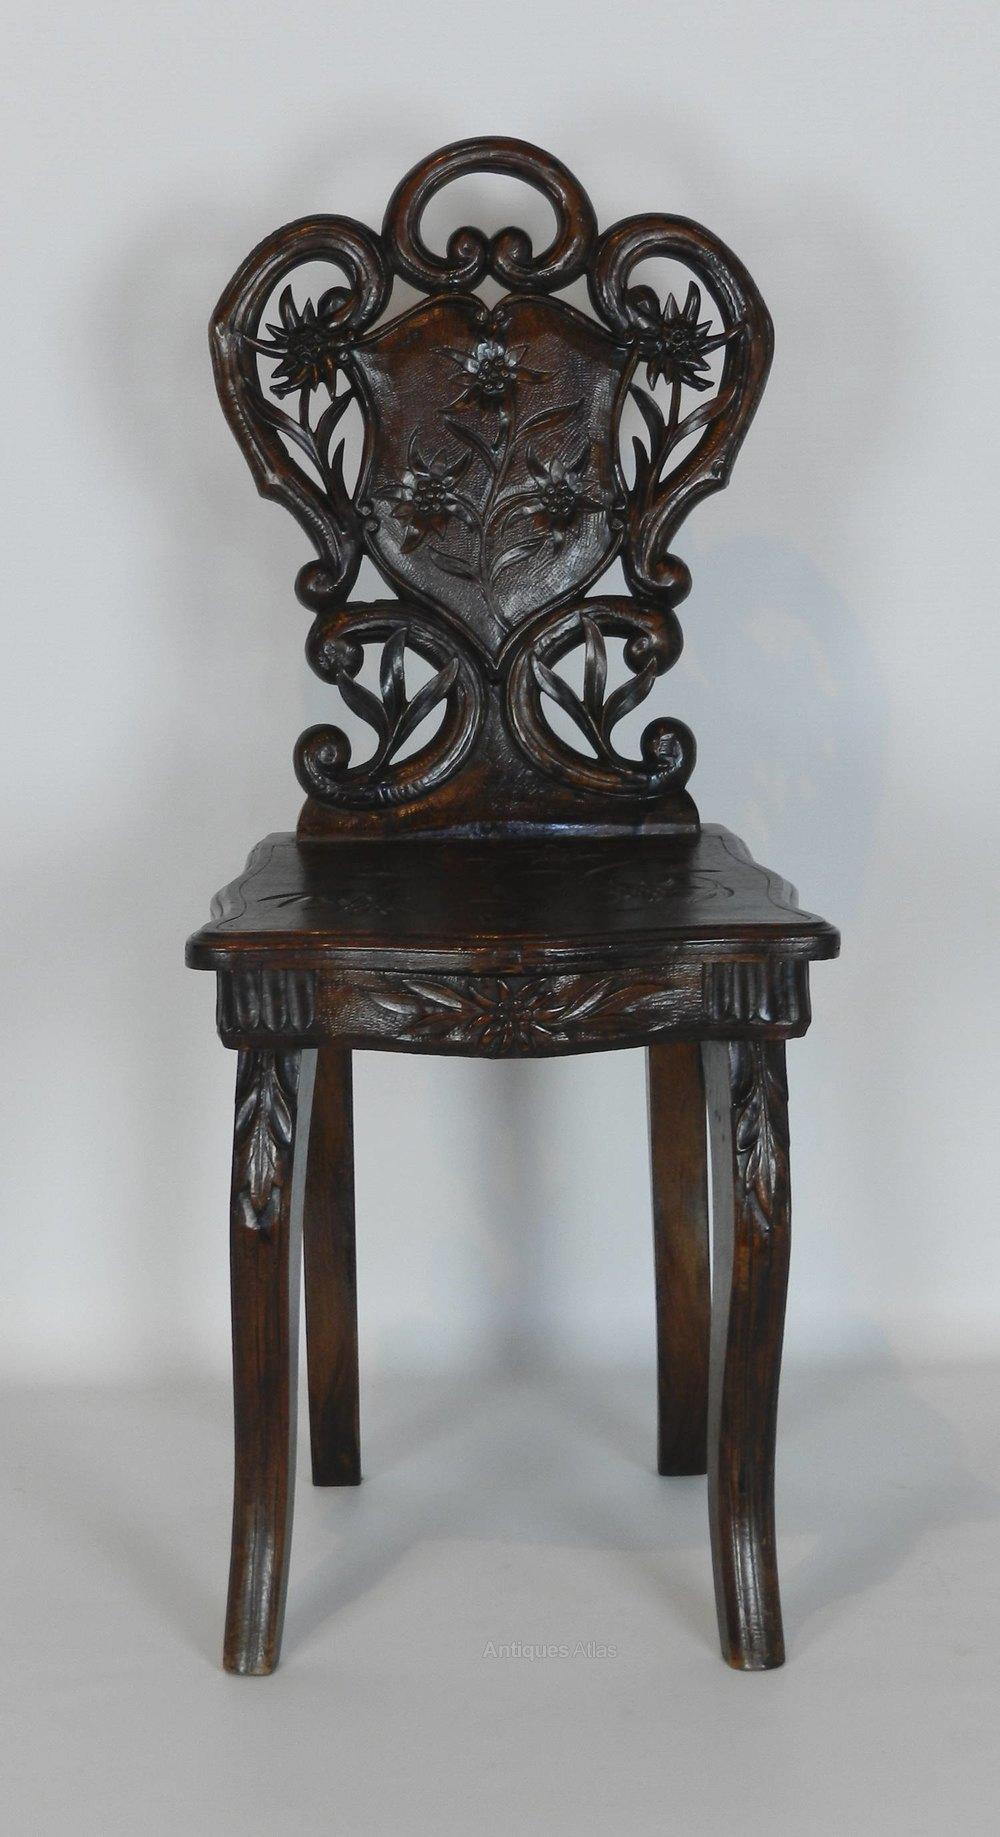 Small Antique Musical Chair ... - Small Antique Musical Chair - Antiques Atlas